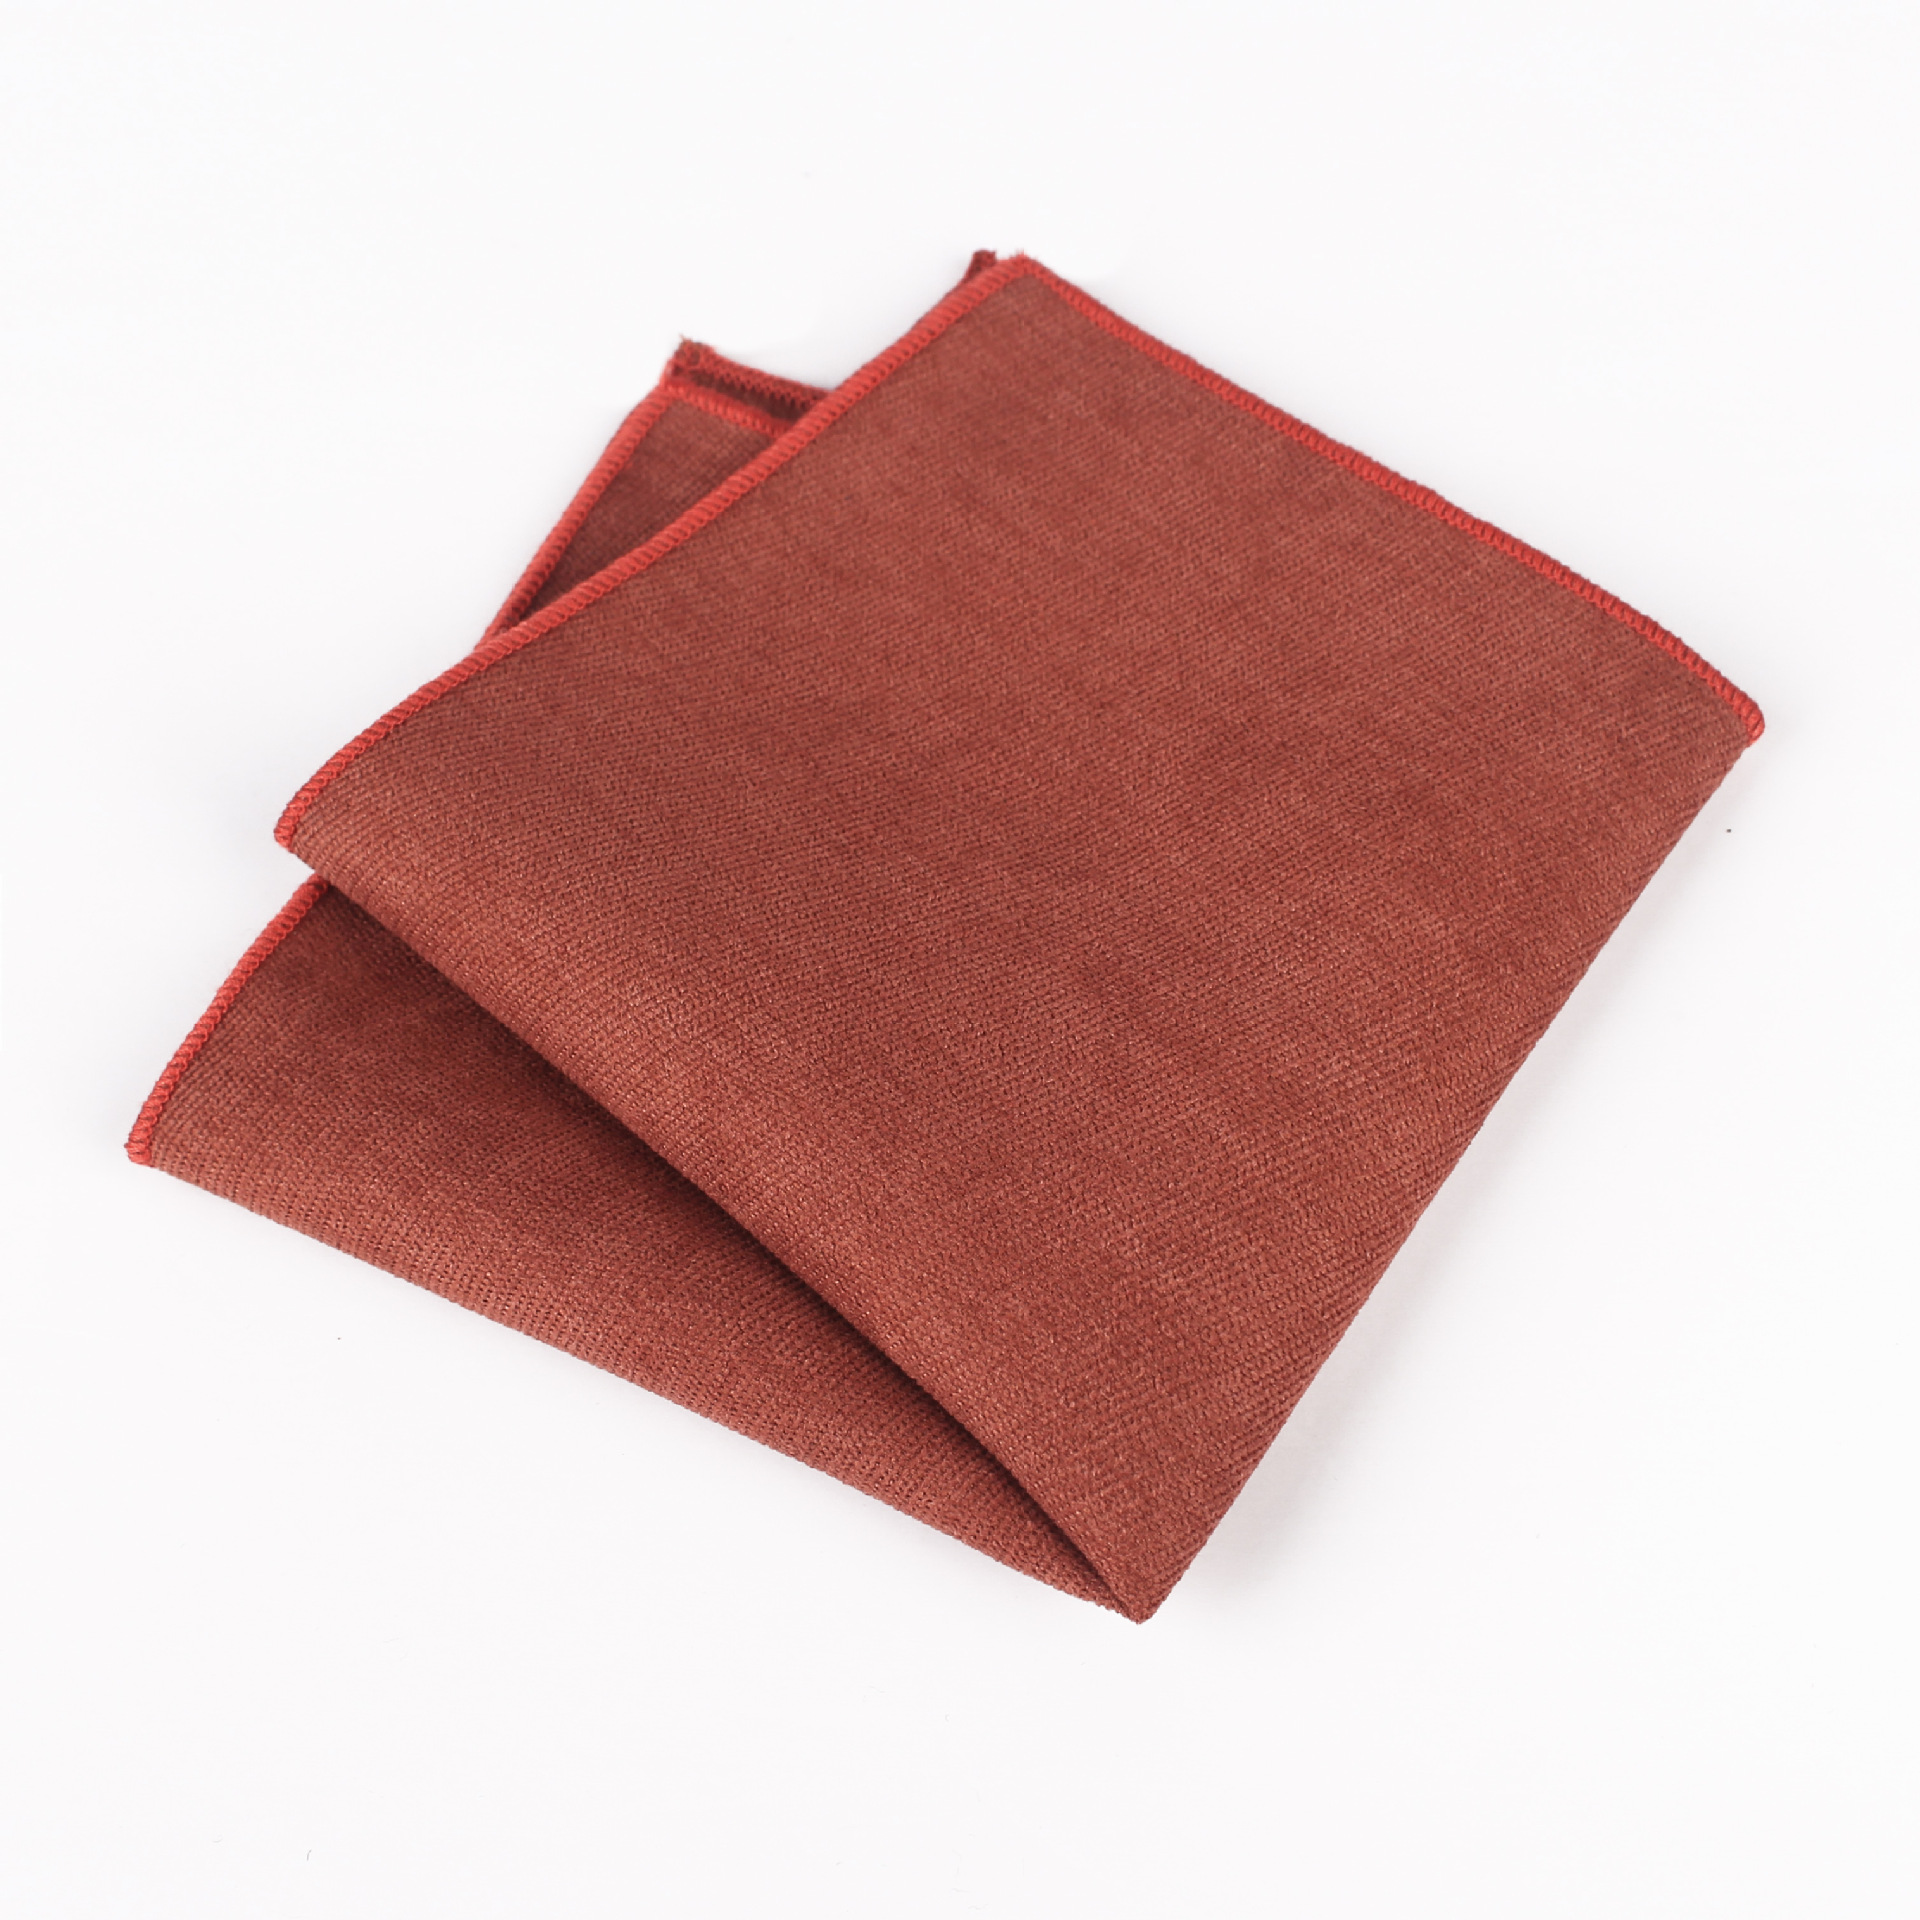 Mantieqingway  Men's Solid Color Suede Hot Sale Explosion Pocket Towel 15 Color Optional Men's Dress Handkerchief Square